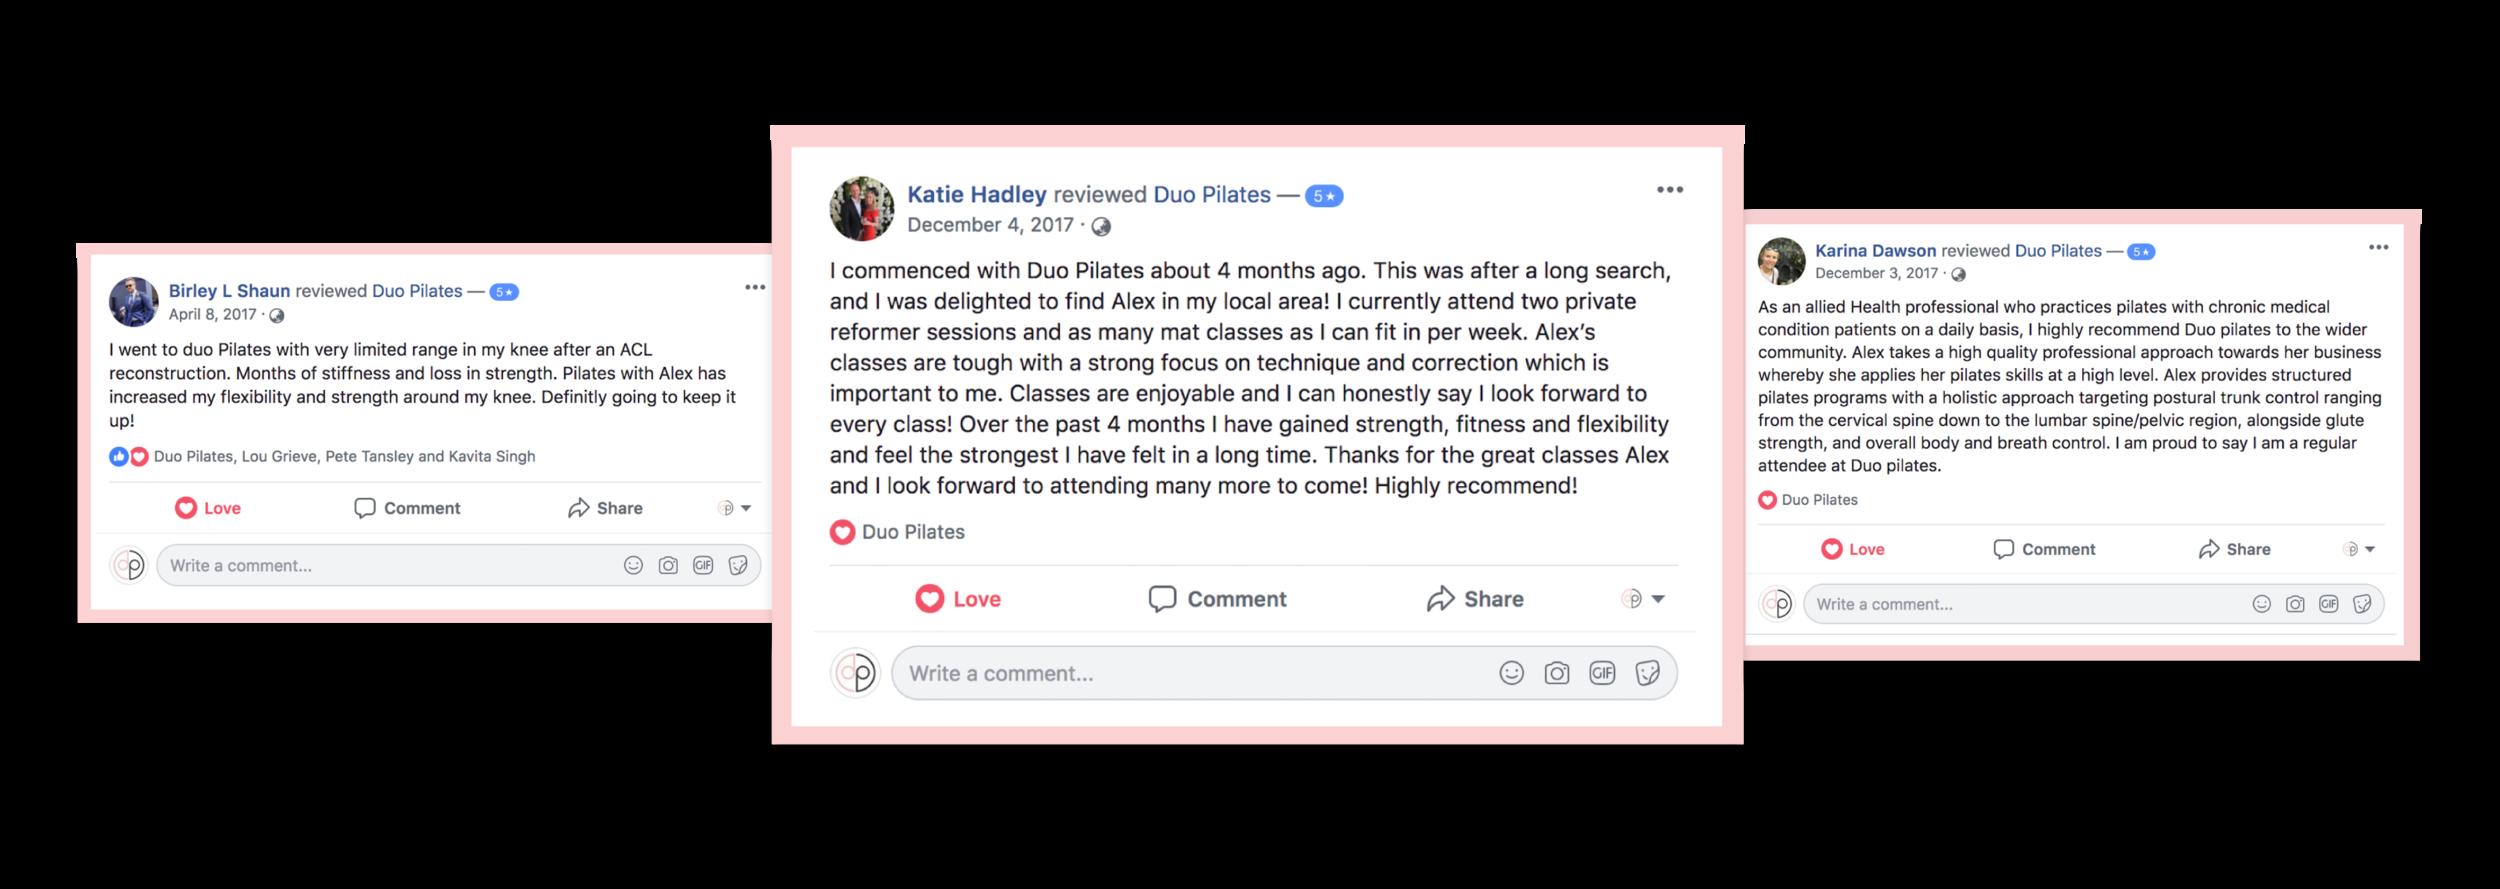 Duo Pilates Testimonials 132.png